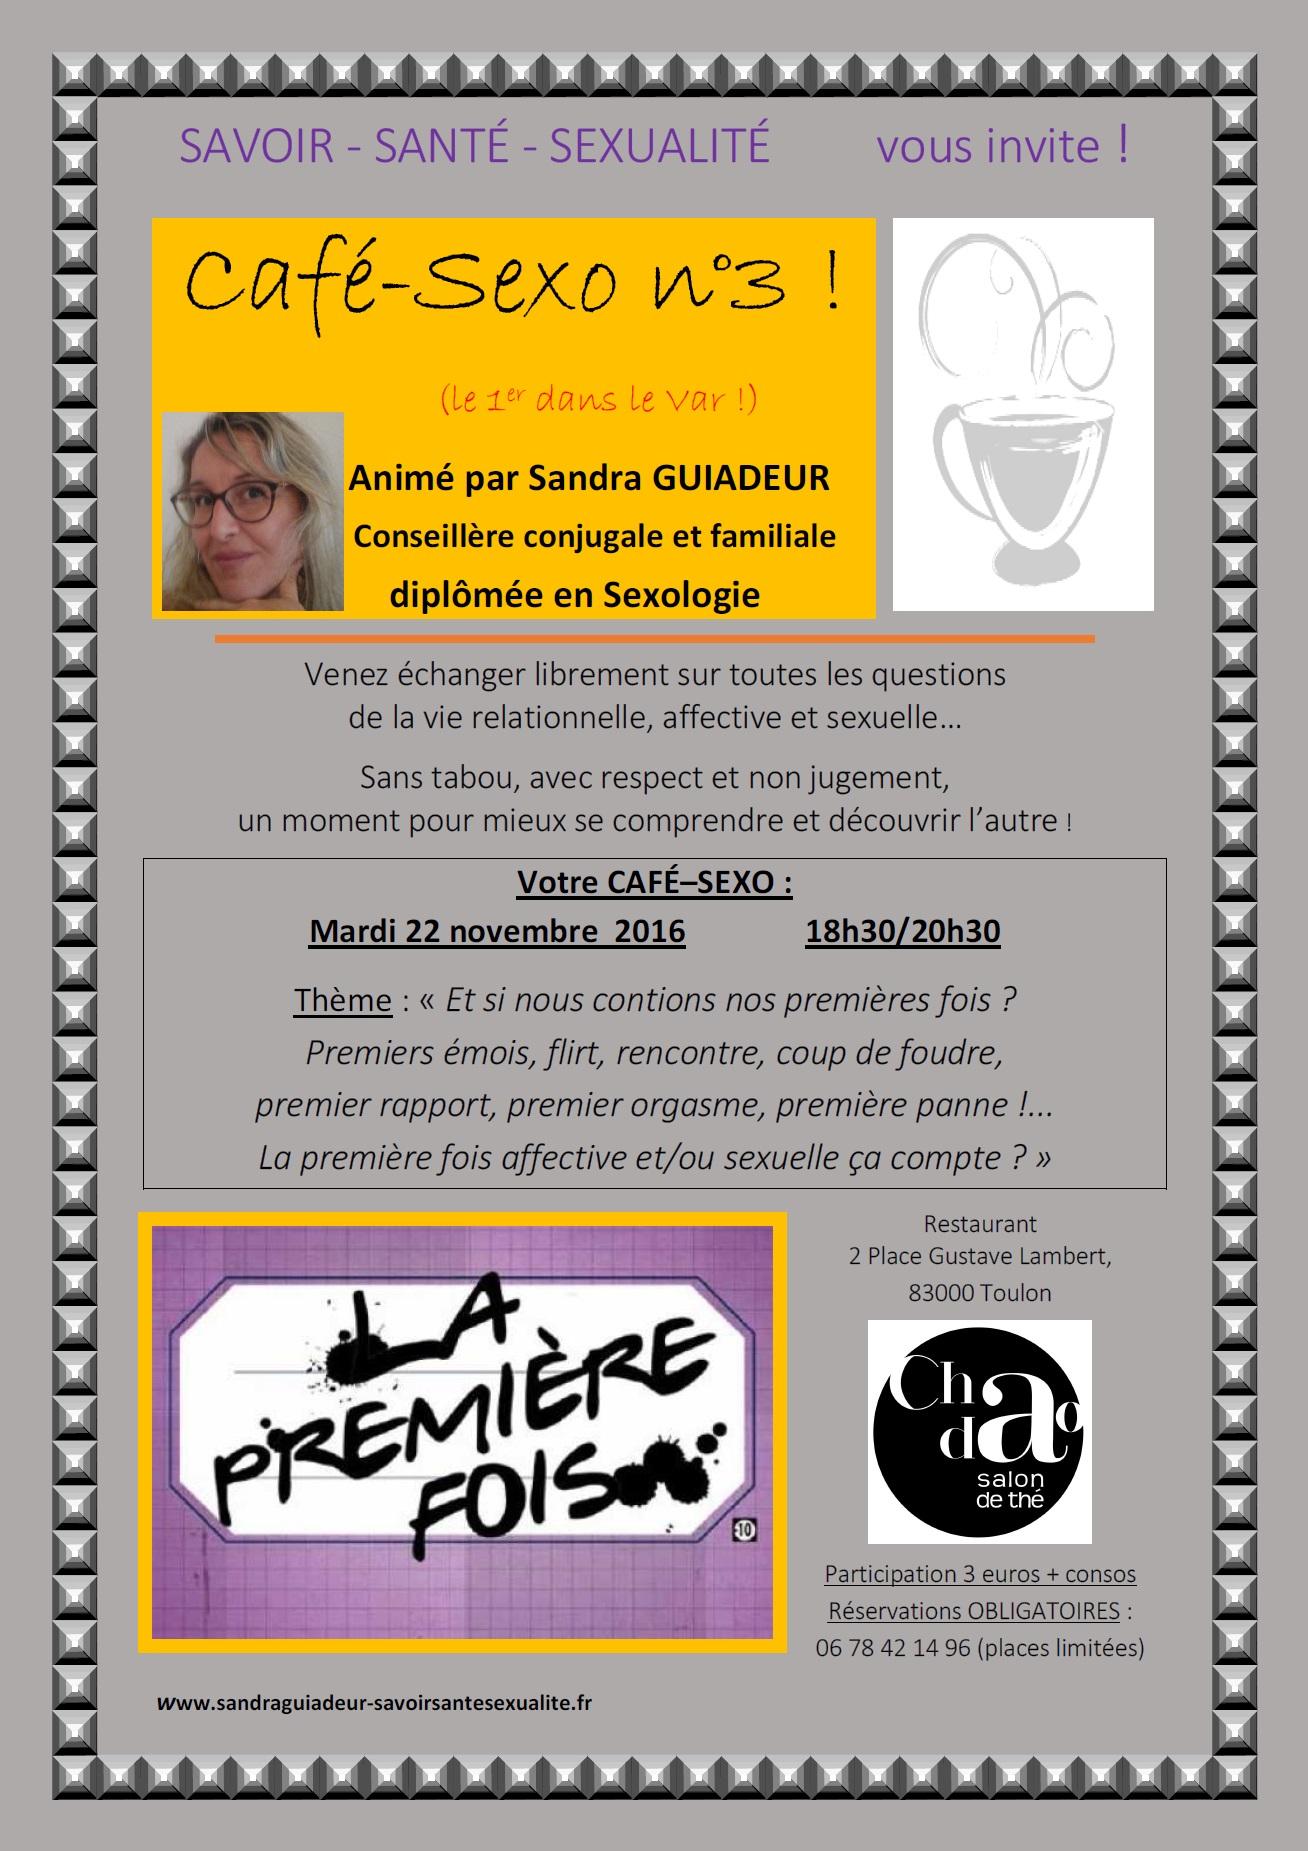 Affiche cafe sexo savoir sante sexualite n 3